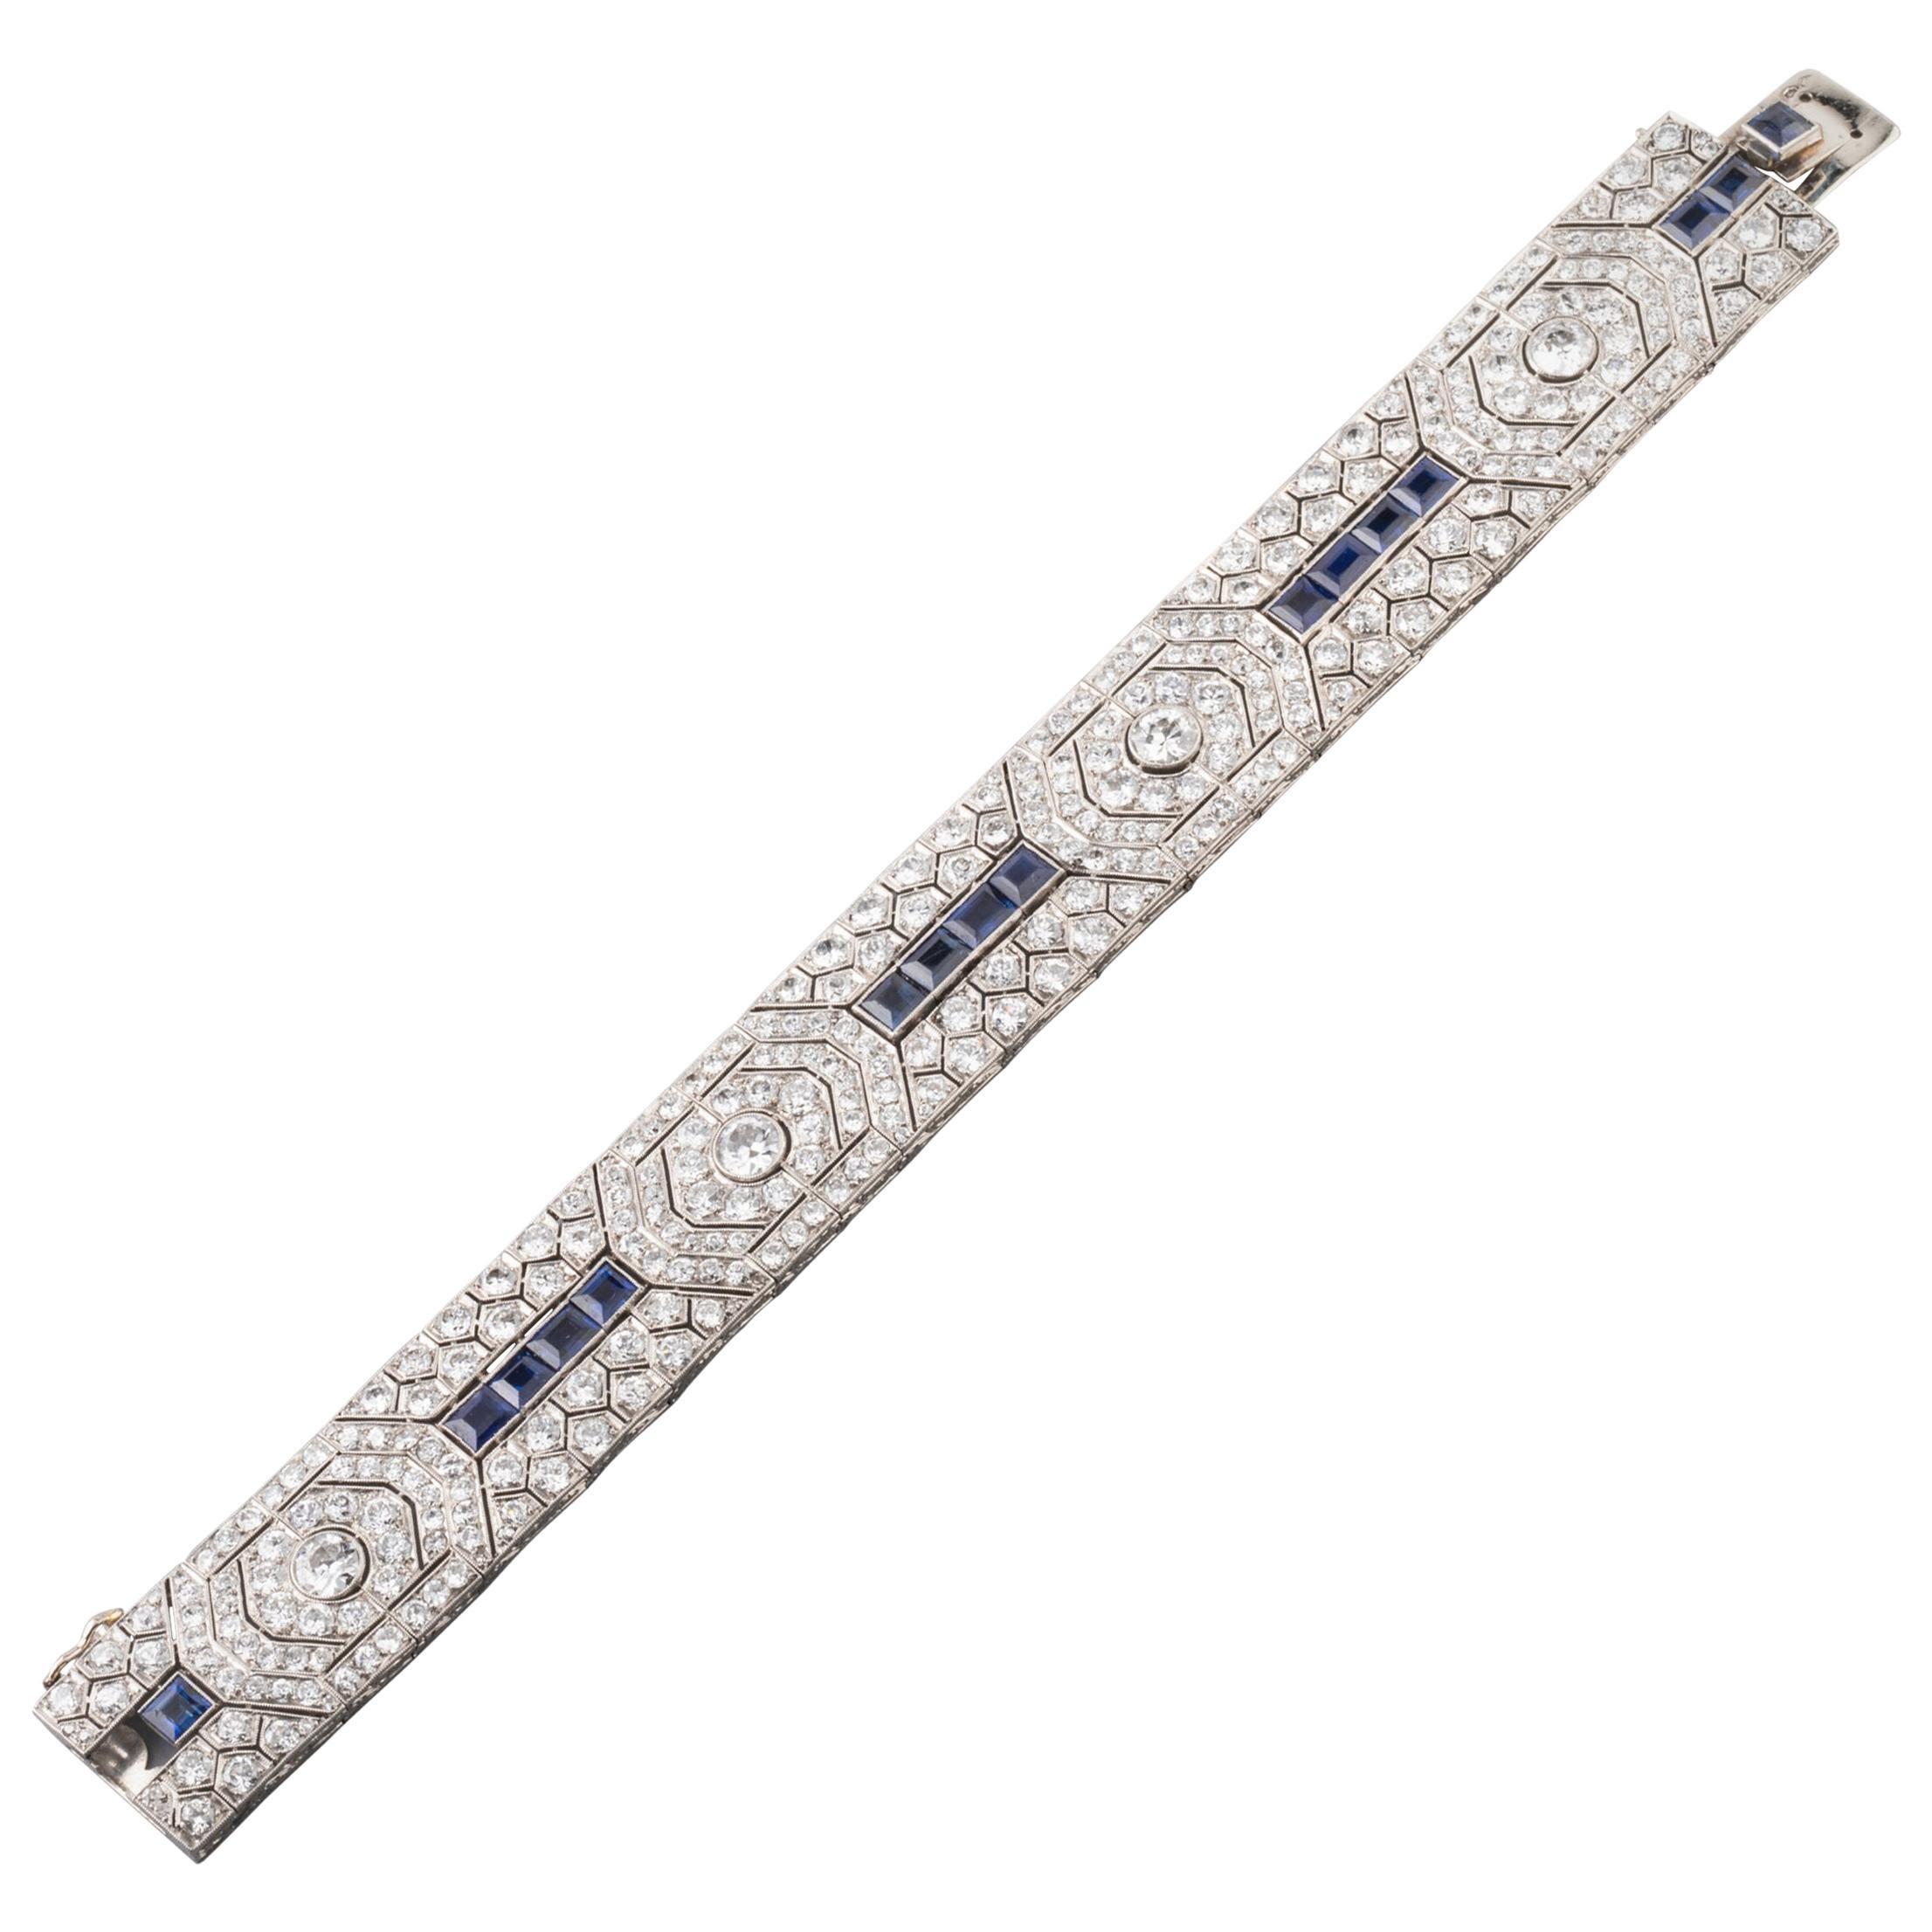 18 Carat Diamonds and 5 Carat Sapphires French Art Deco Bracelet